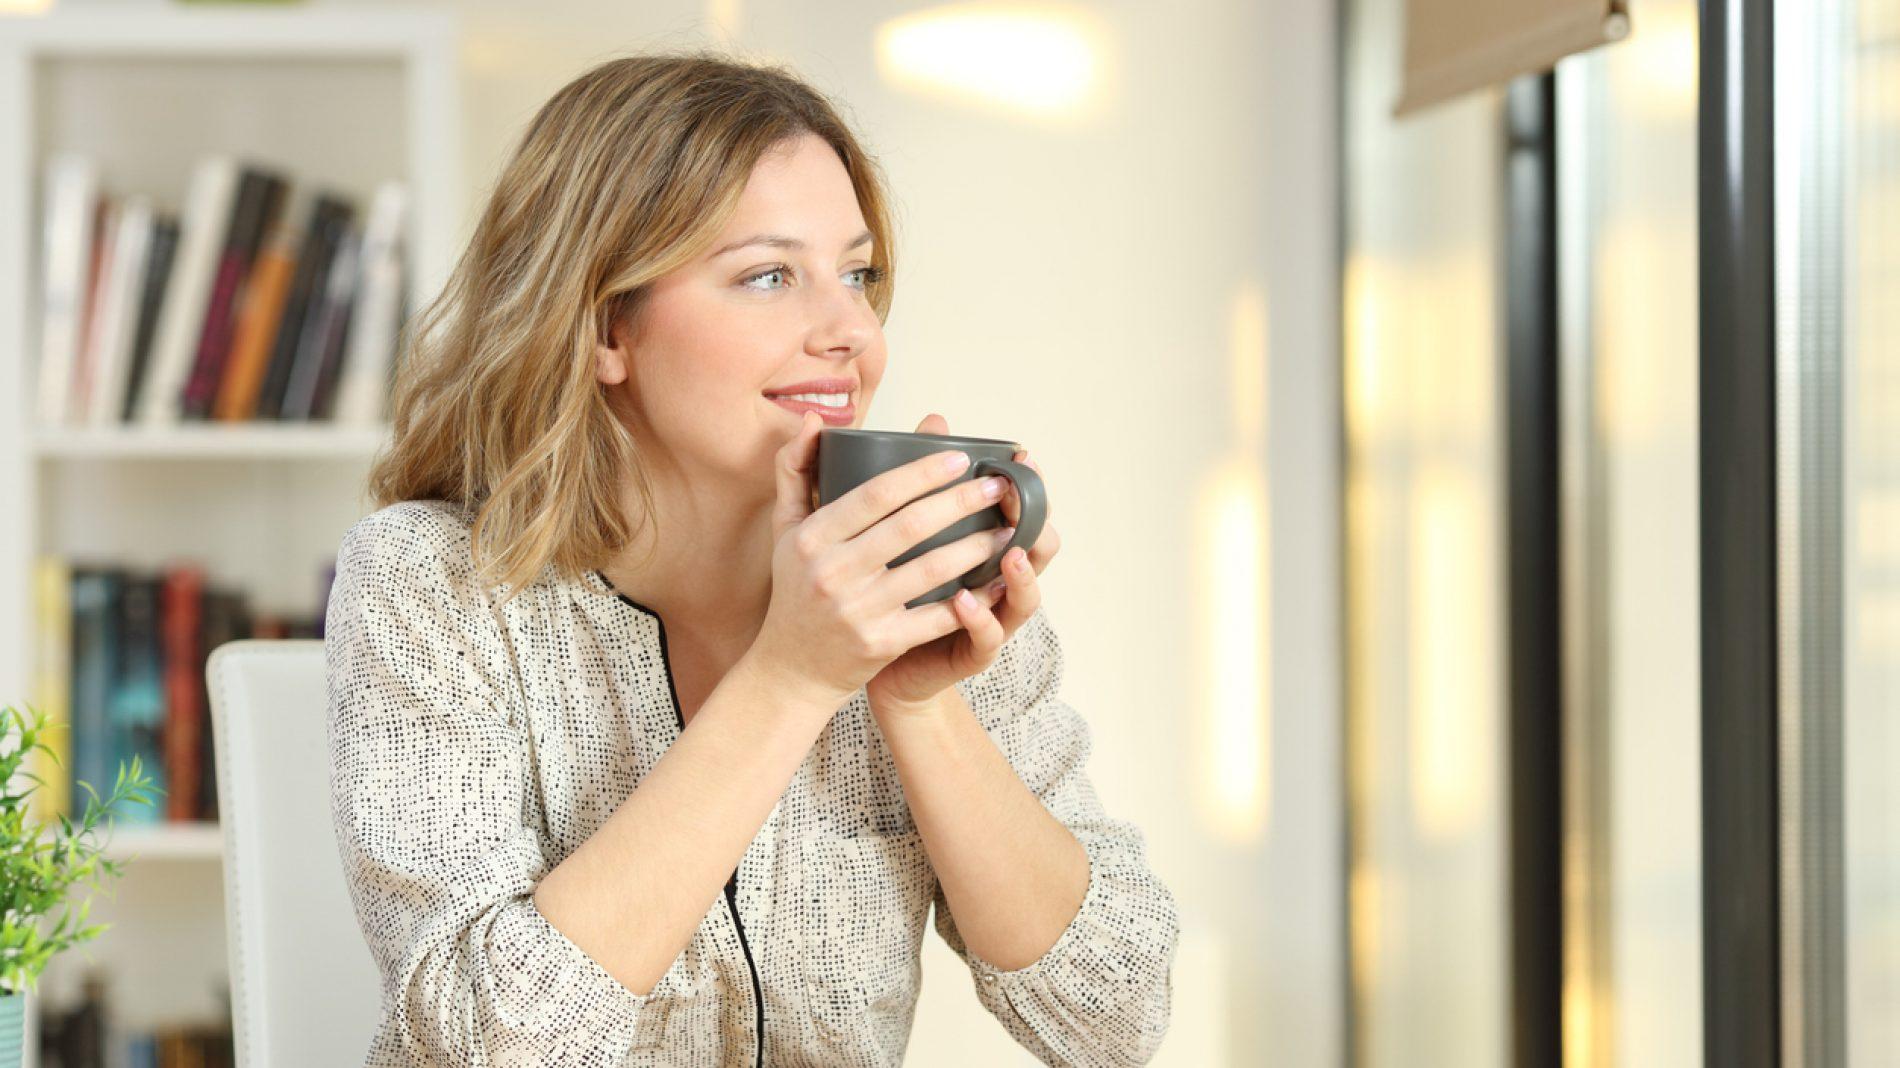 Woman looking through a window drinking coffee